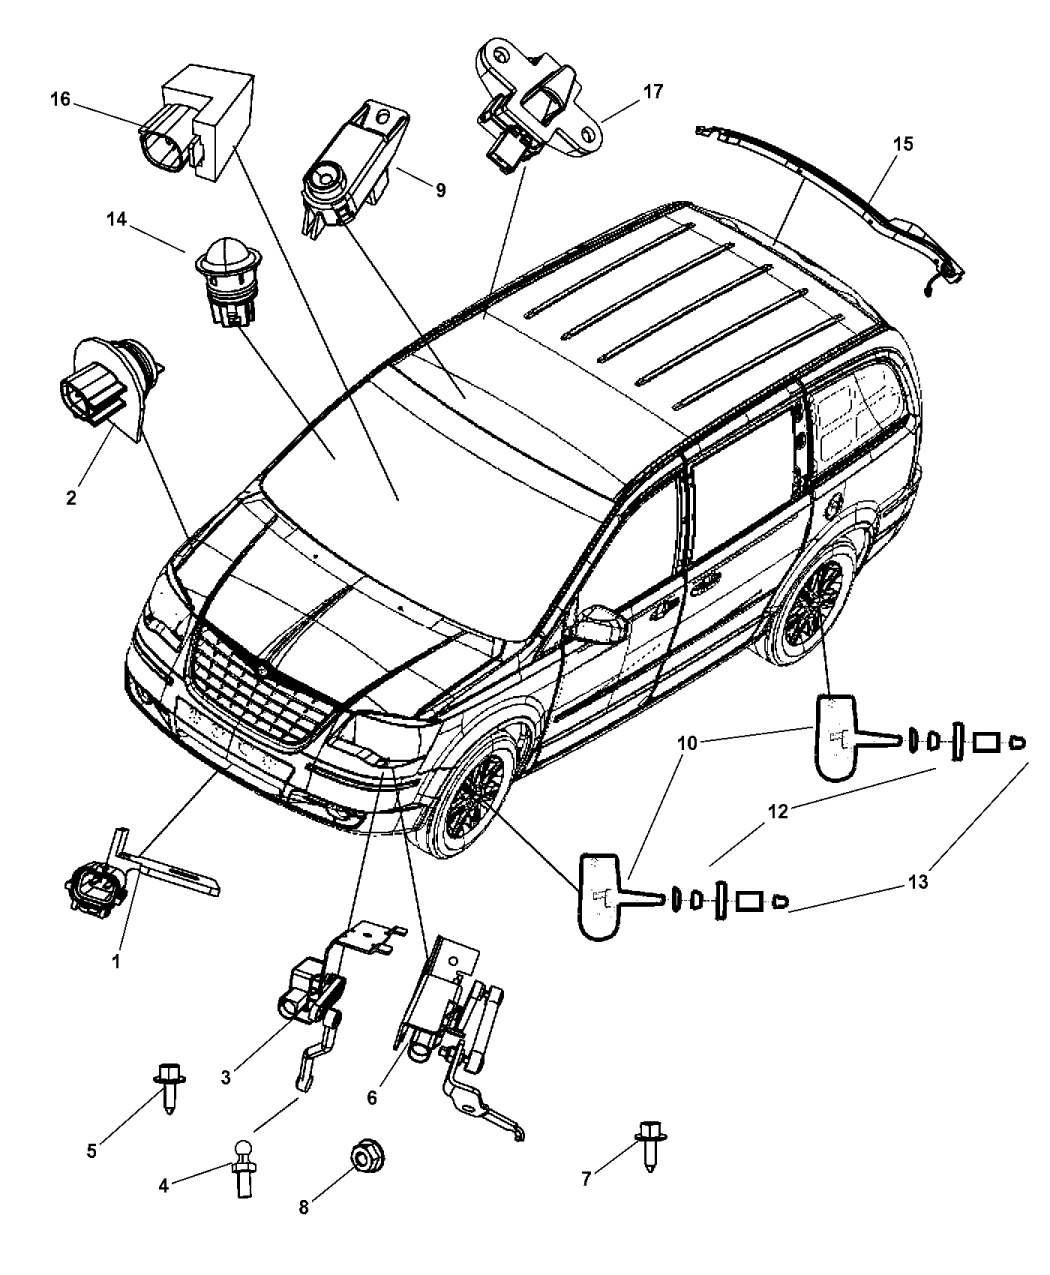 2008 Dodge Grand Caravan Sensors Body - Mopar Parts Giant